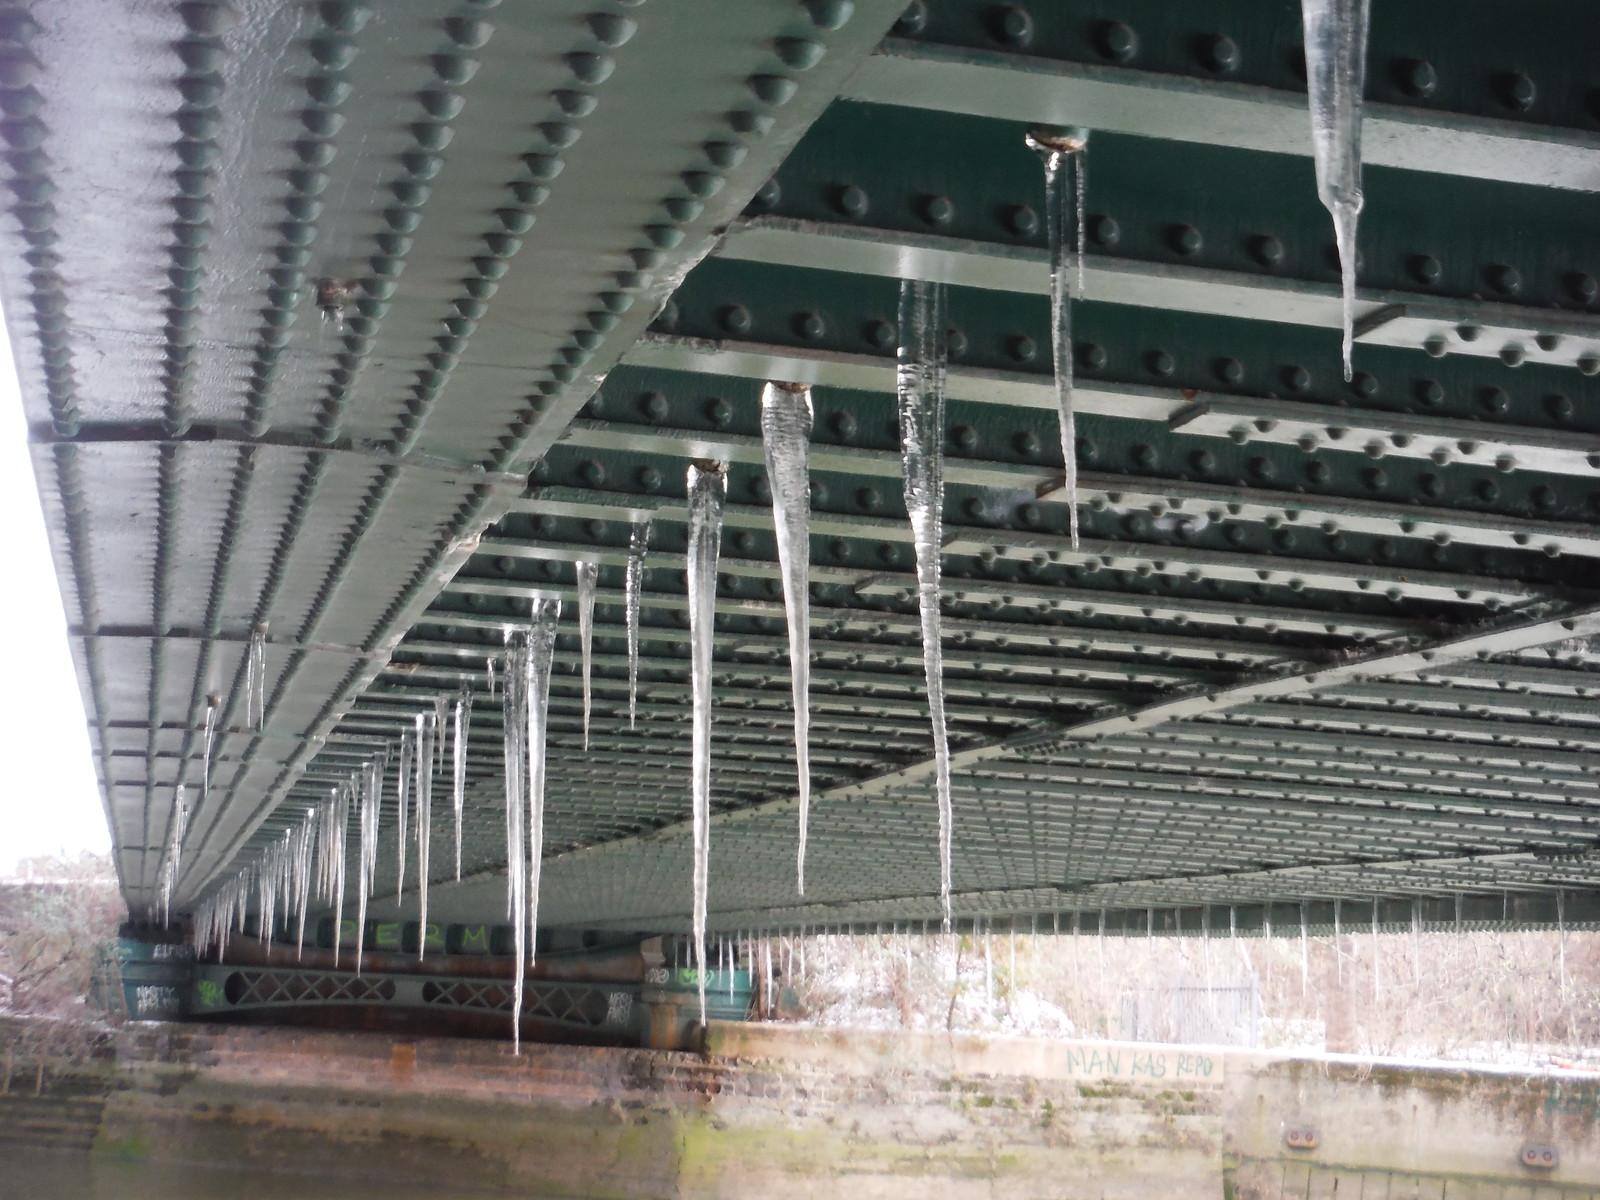 Icicles under Railway Bridge SWC Short Walk 21 - The Line Modern Art Walk (Stratford to North Greenwich)